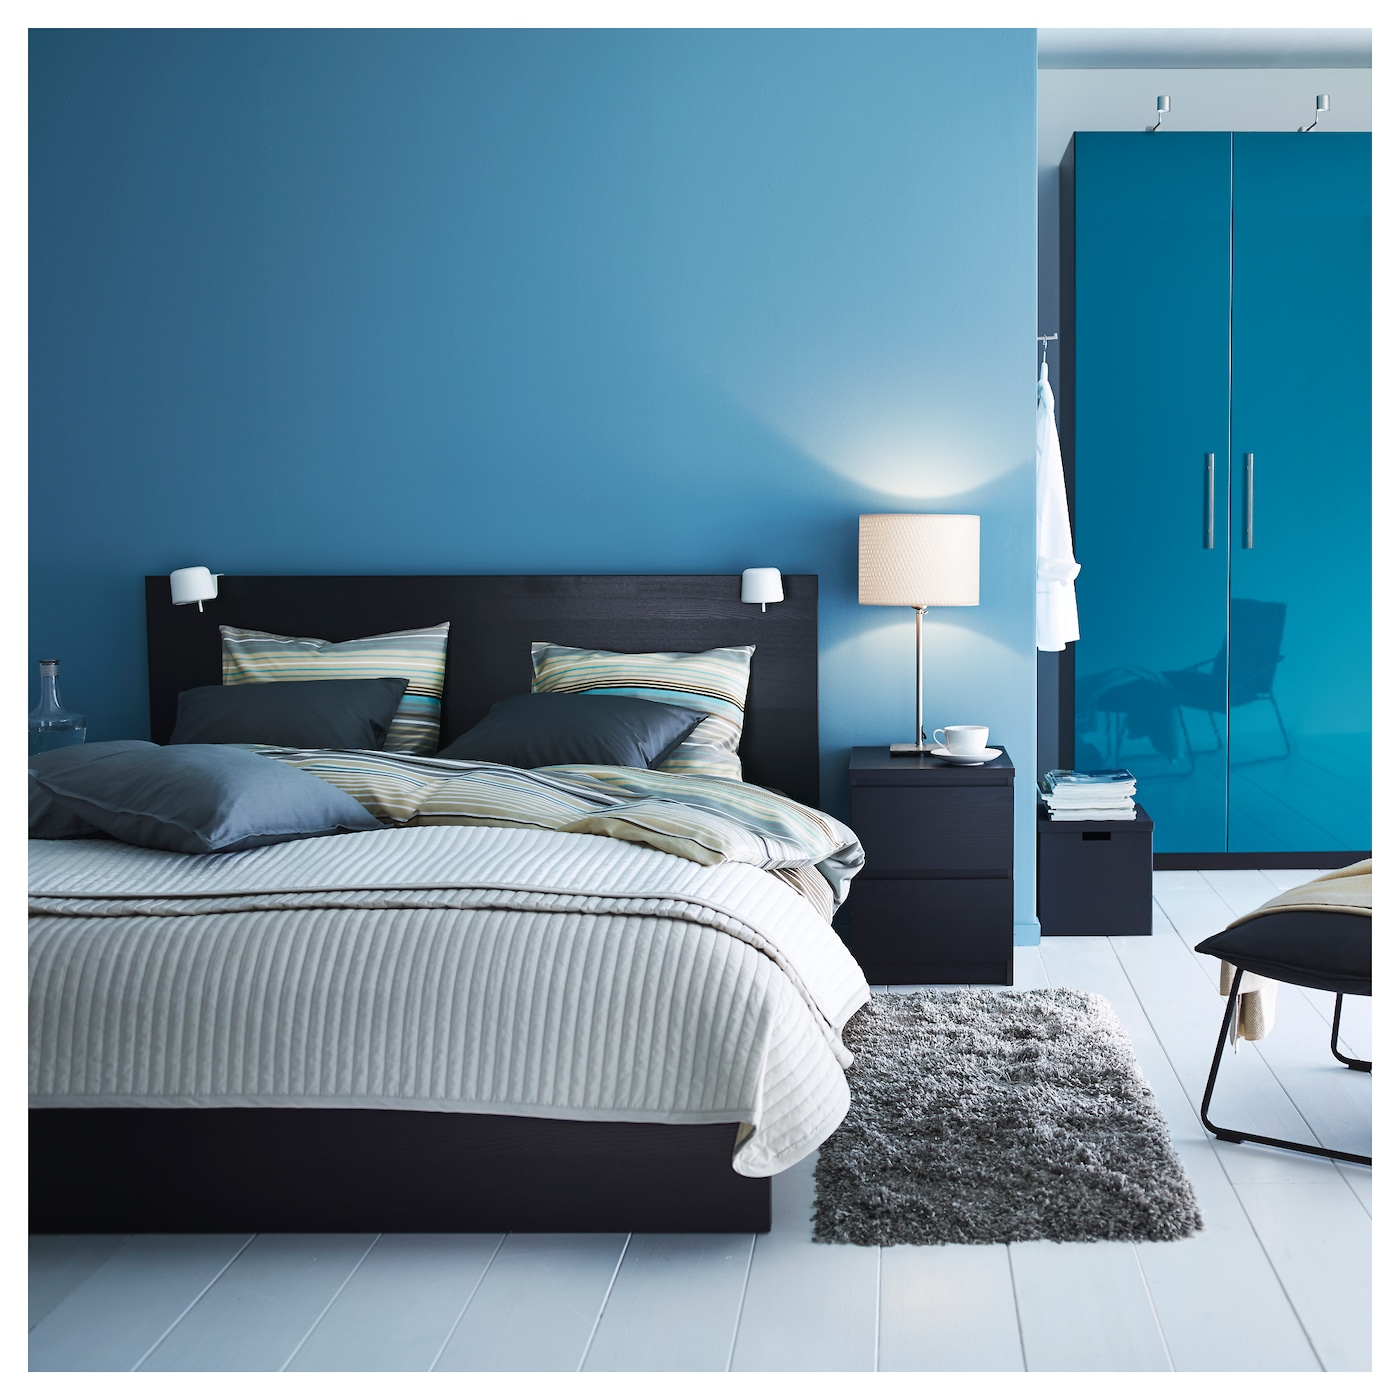 malm cadre de lit haut brun noir leirsund 140 x 200 cm ikea. Black Bedroom Furniture Sets. Home Design Ideas